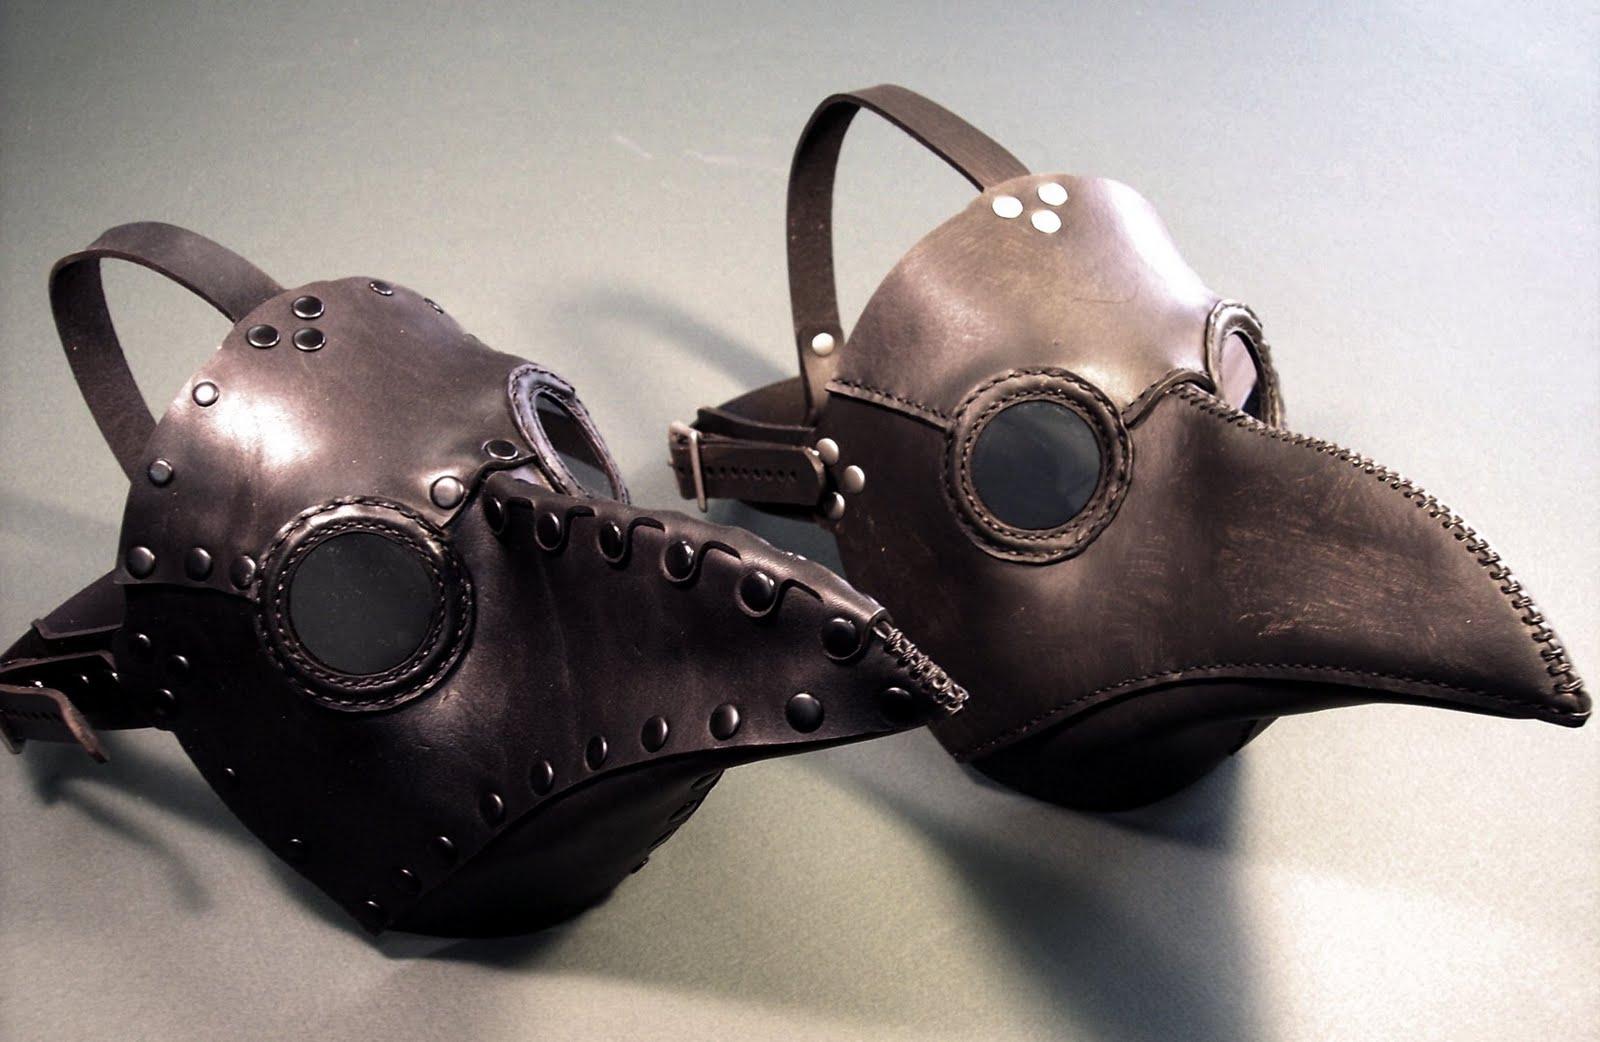 Beak Shaped Mask Shape of The Mask as Close